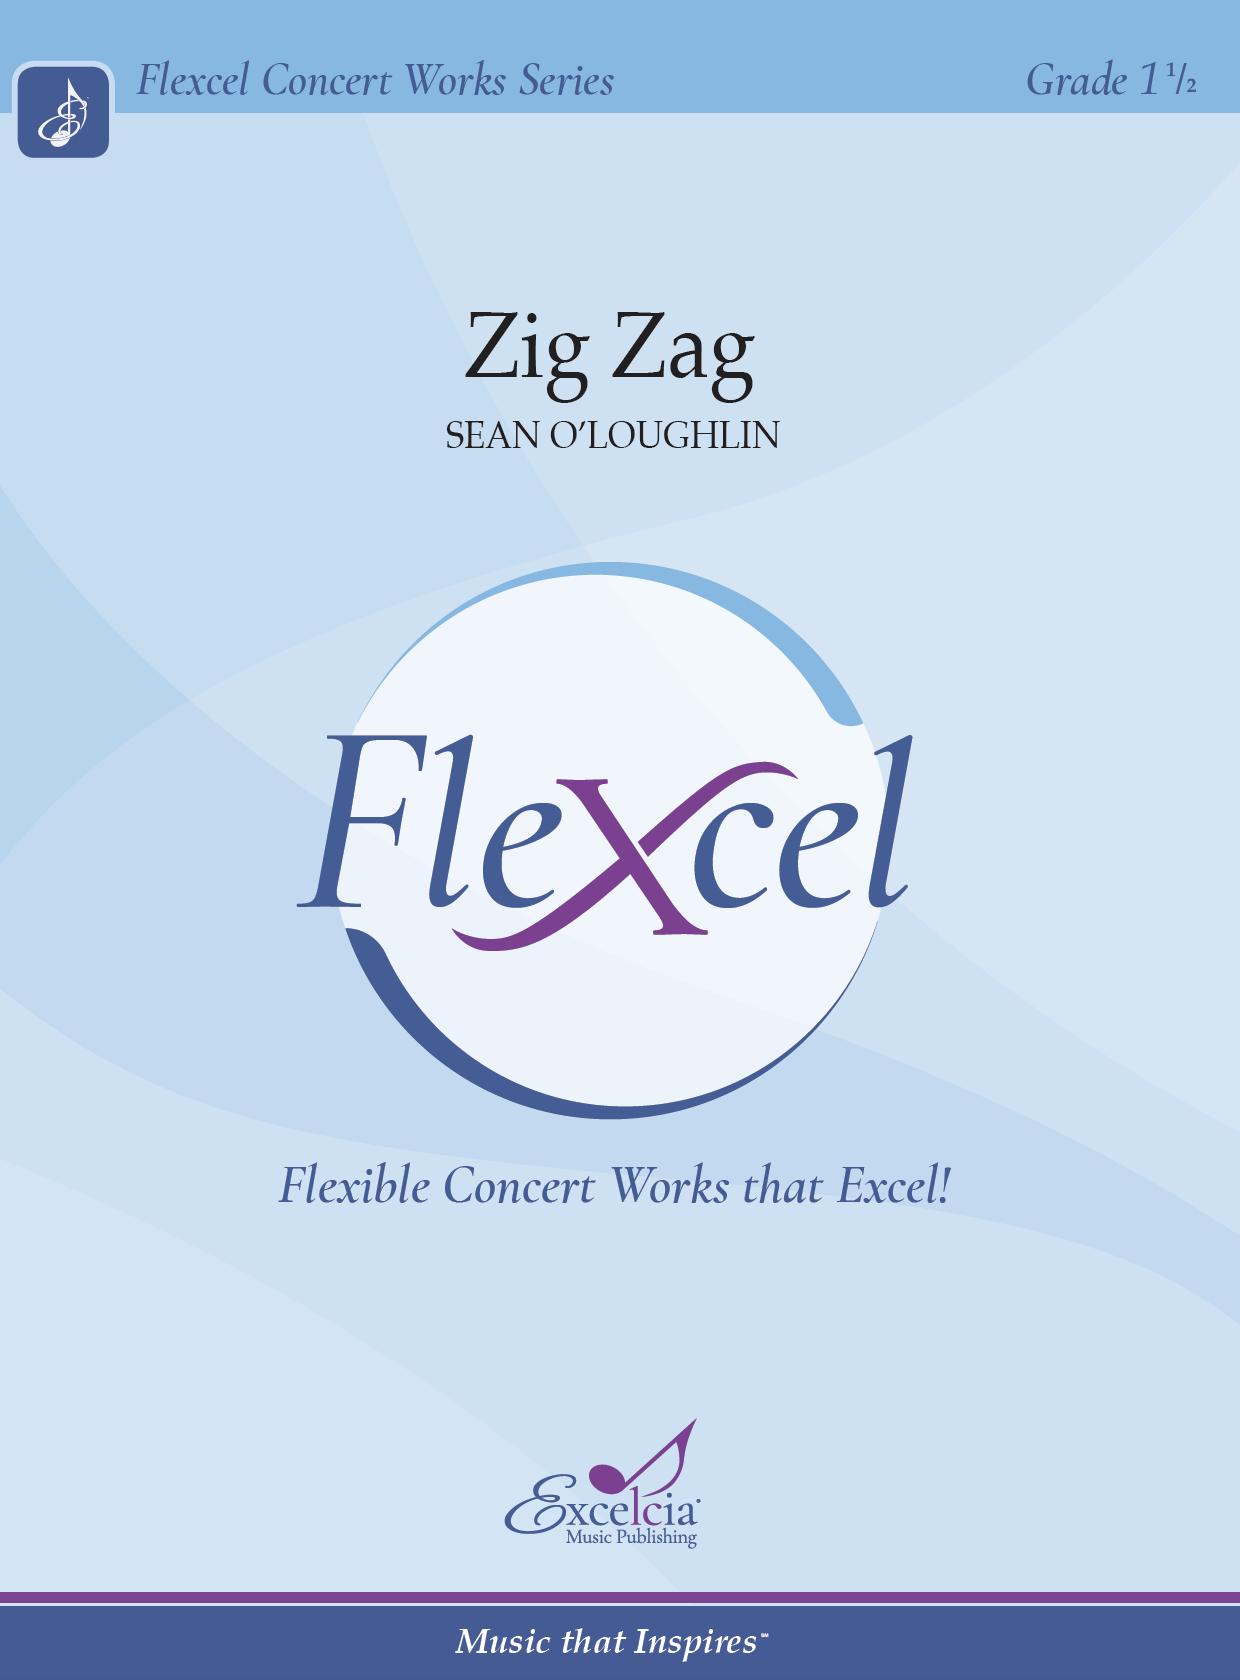 fcb2107-zig-zag-oloughlin